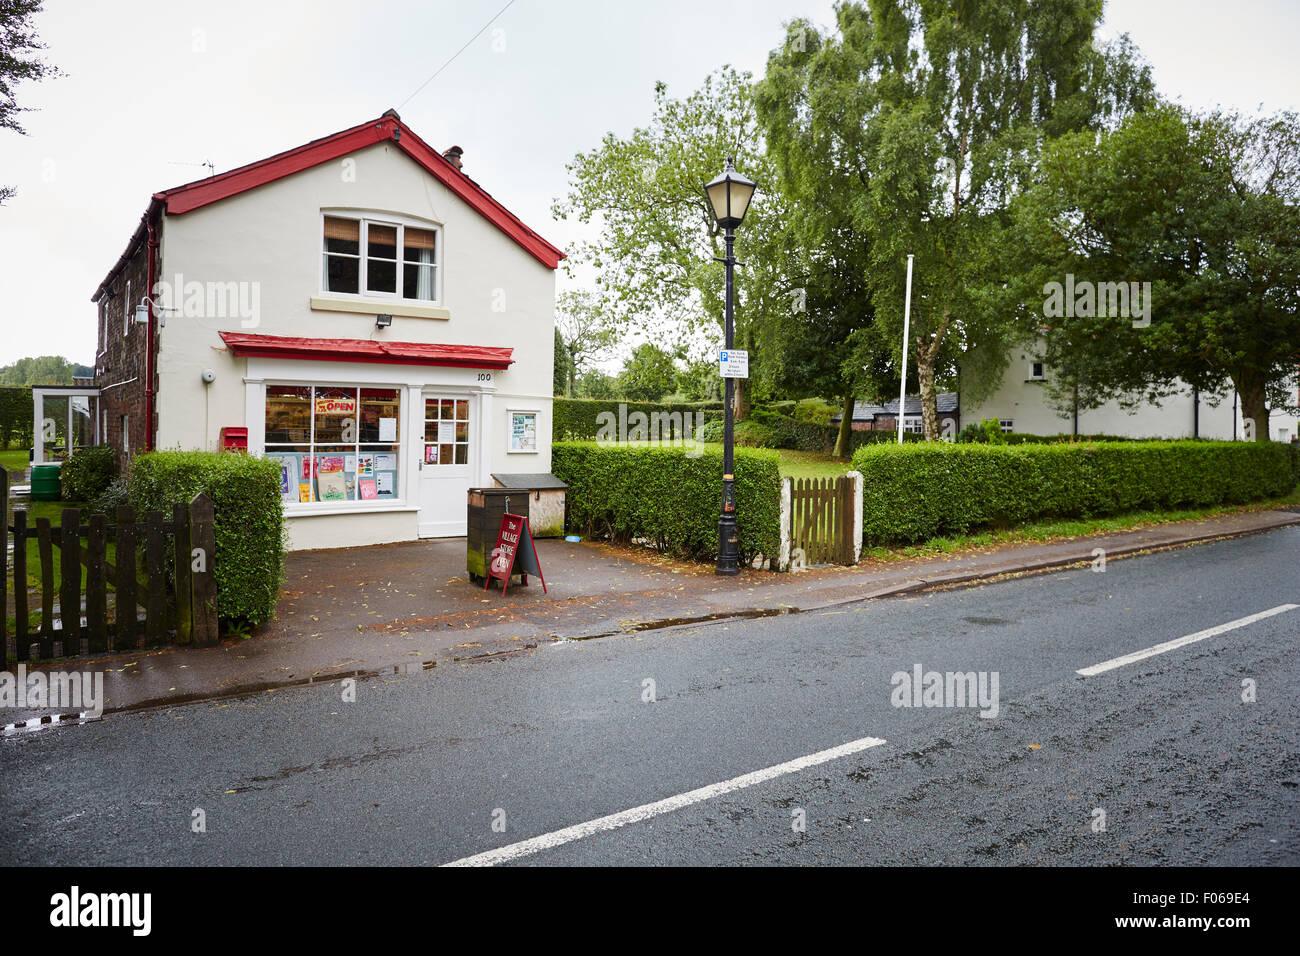 Dunham Massey Viaalge nr Altrincham village store   Dunham Massey Village  nr Altrincham  UK Great Britain British - Stock Image